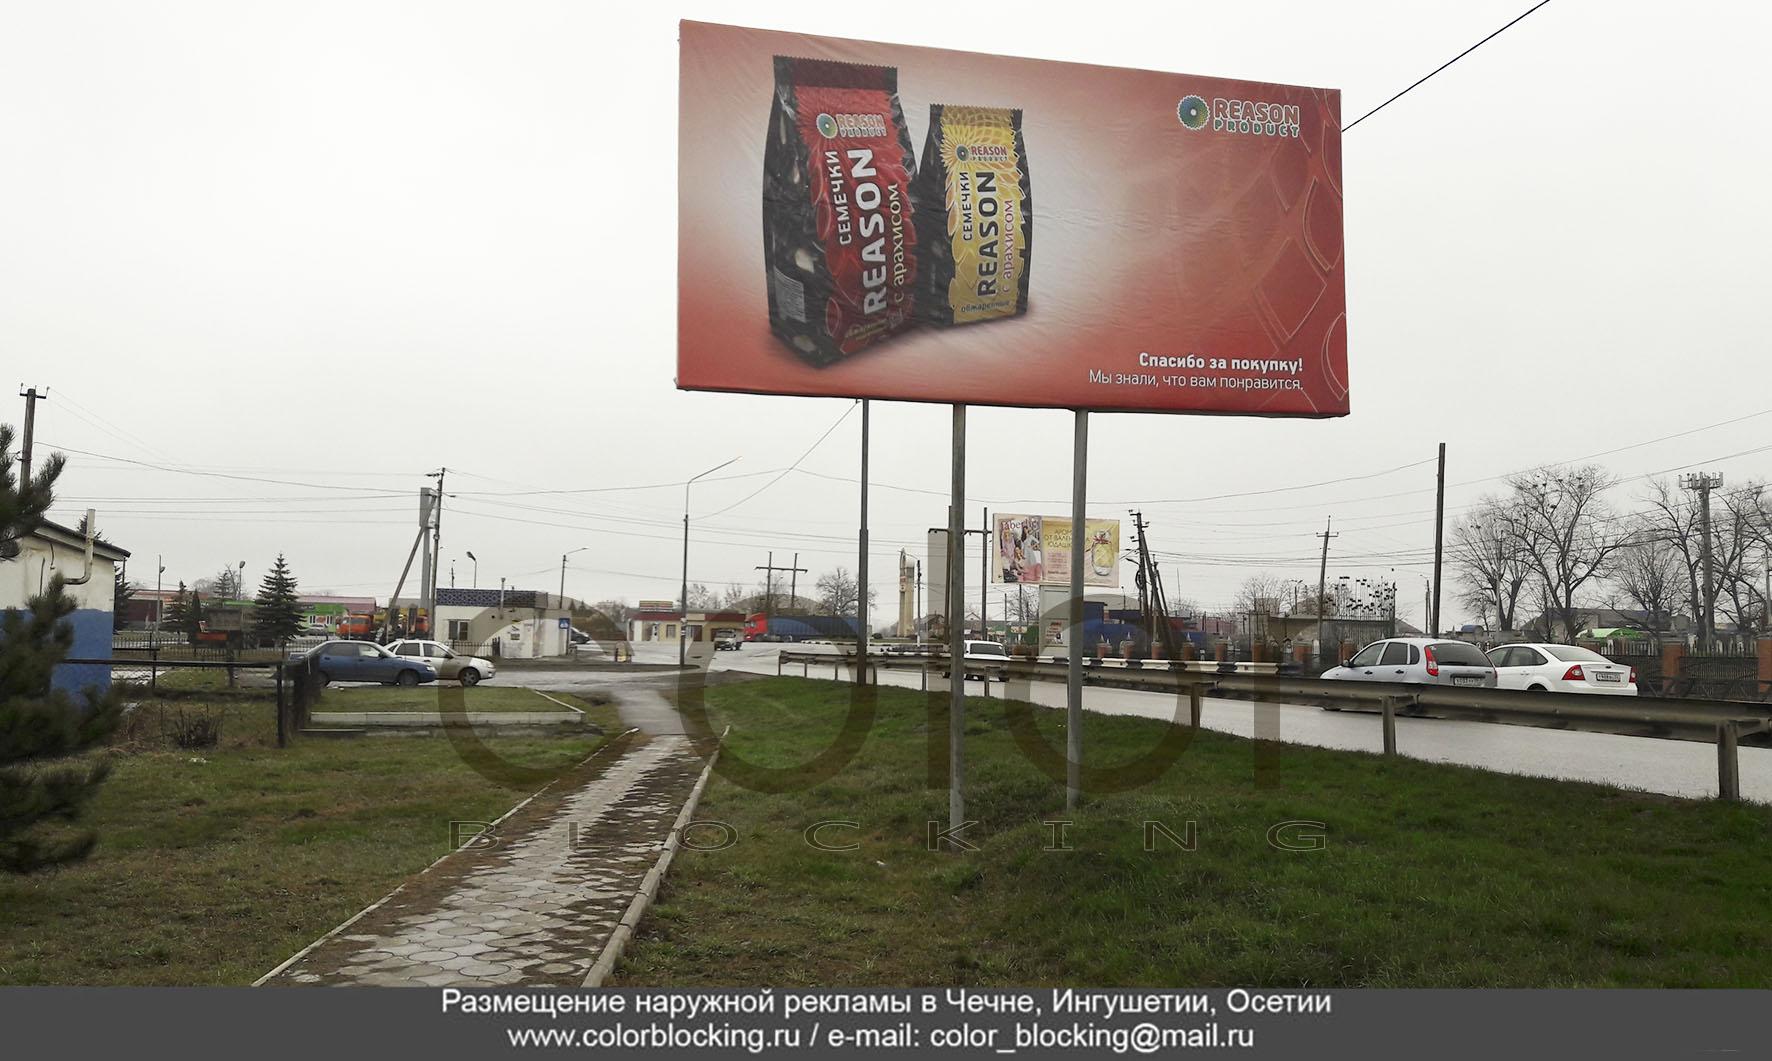 Наружная реклама в Назрани Ингушетия